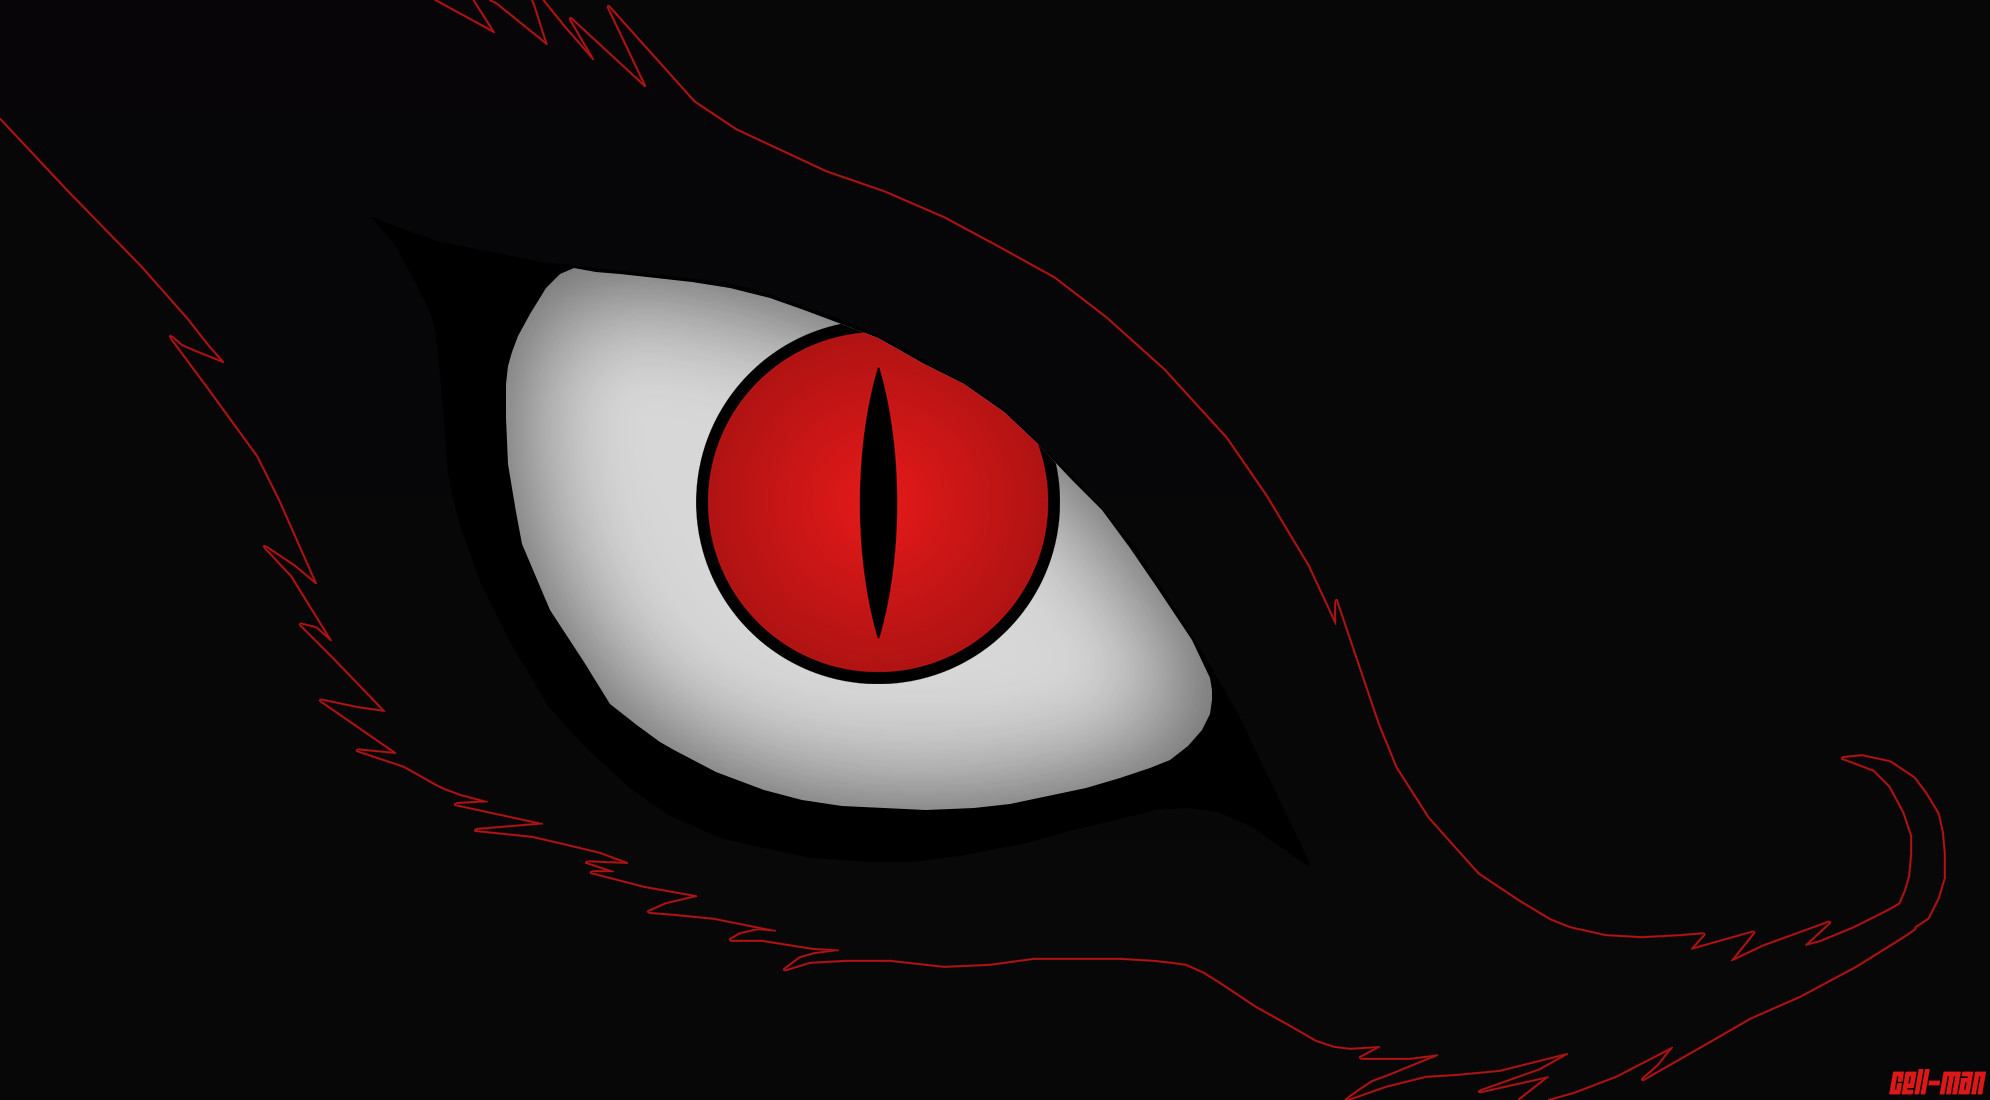 … Kyuubi (Nine Tails Demon Fox)'s Eye Wallpaper by CELL-MAN